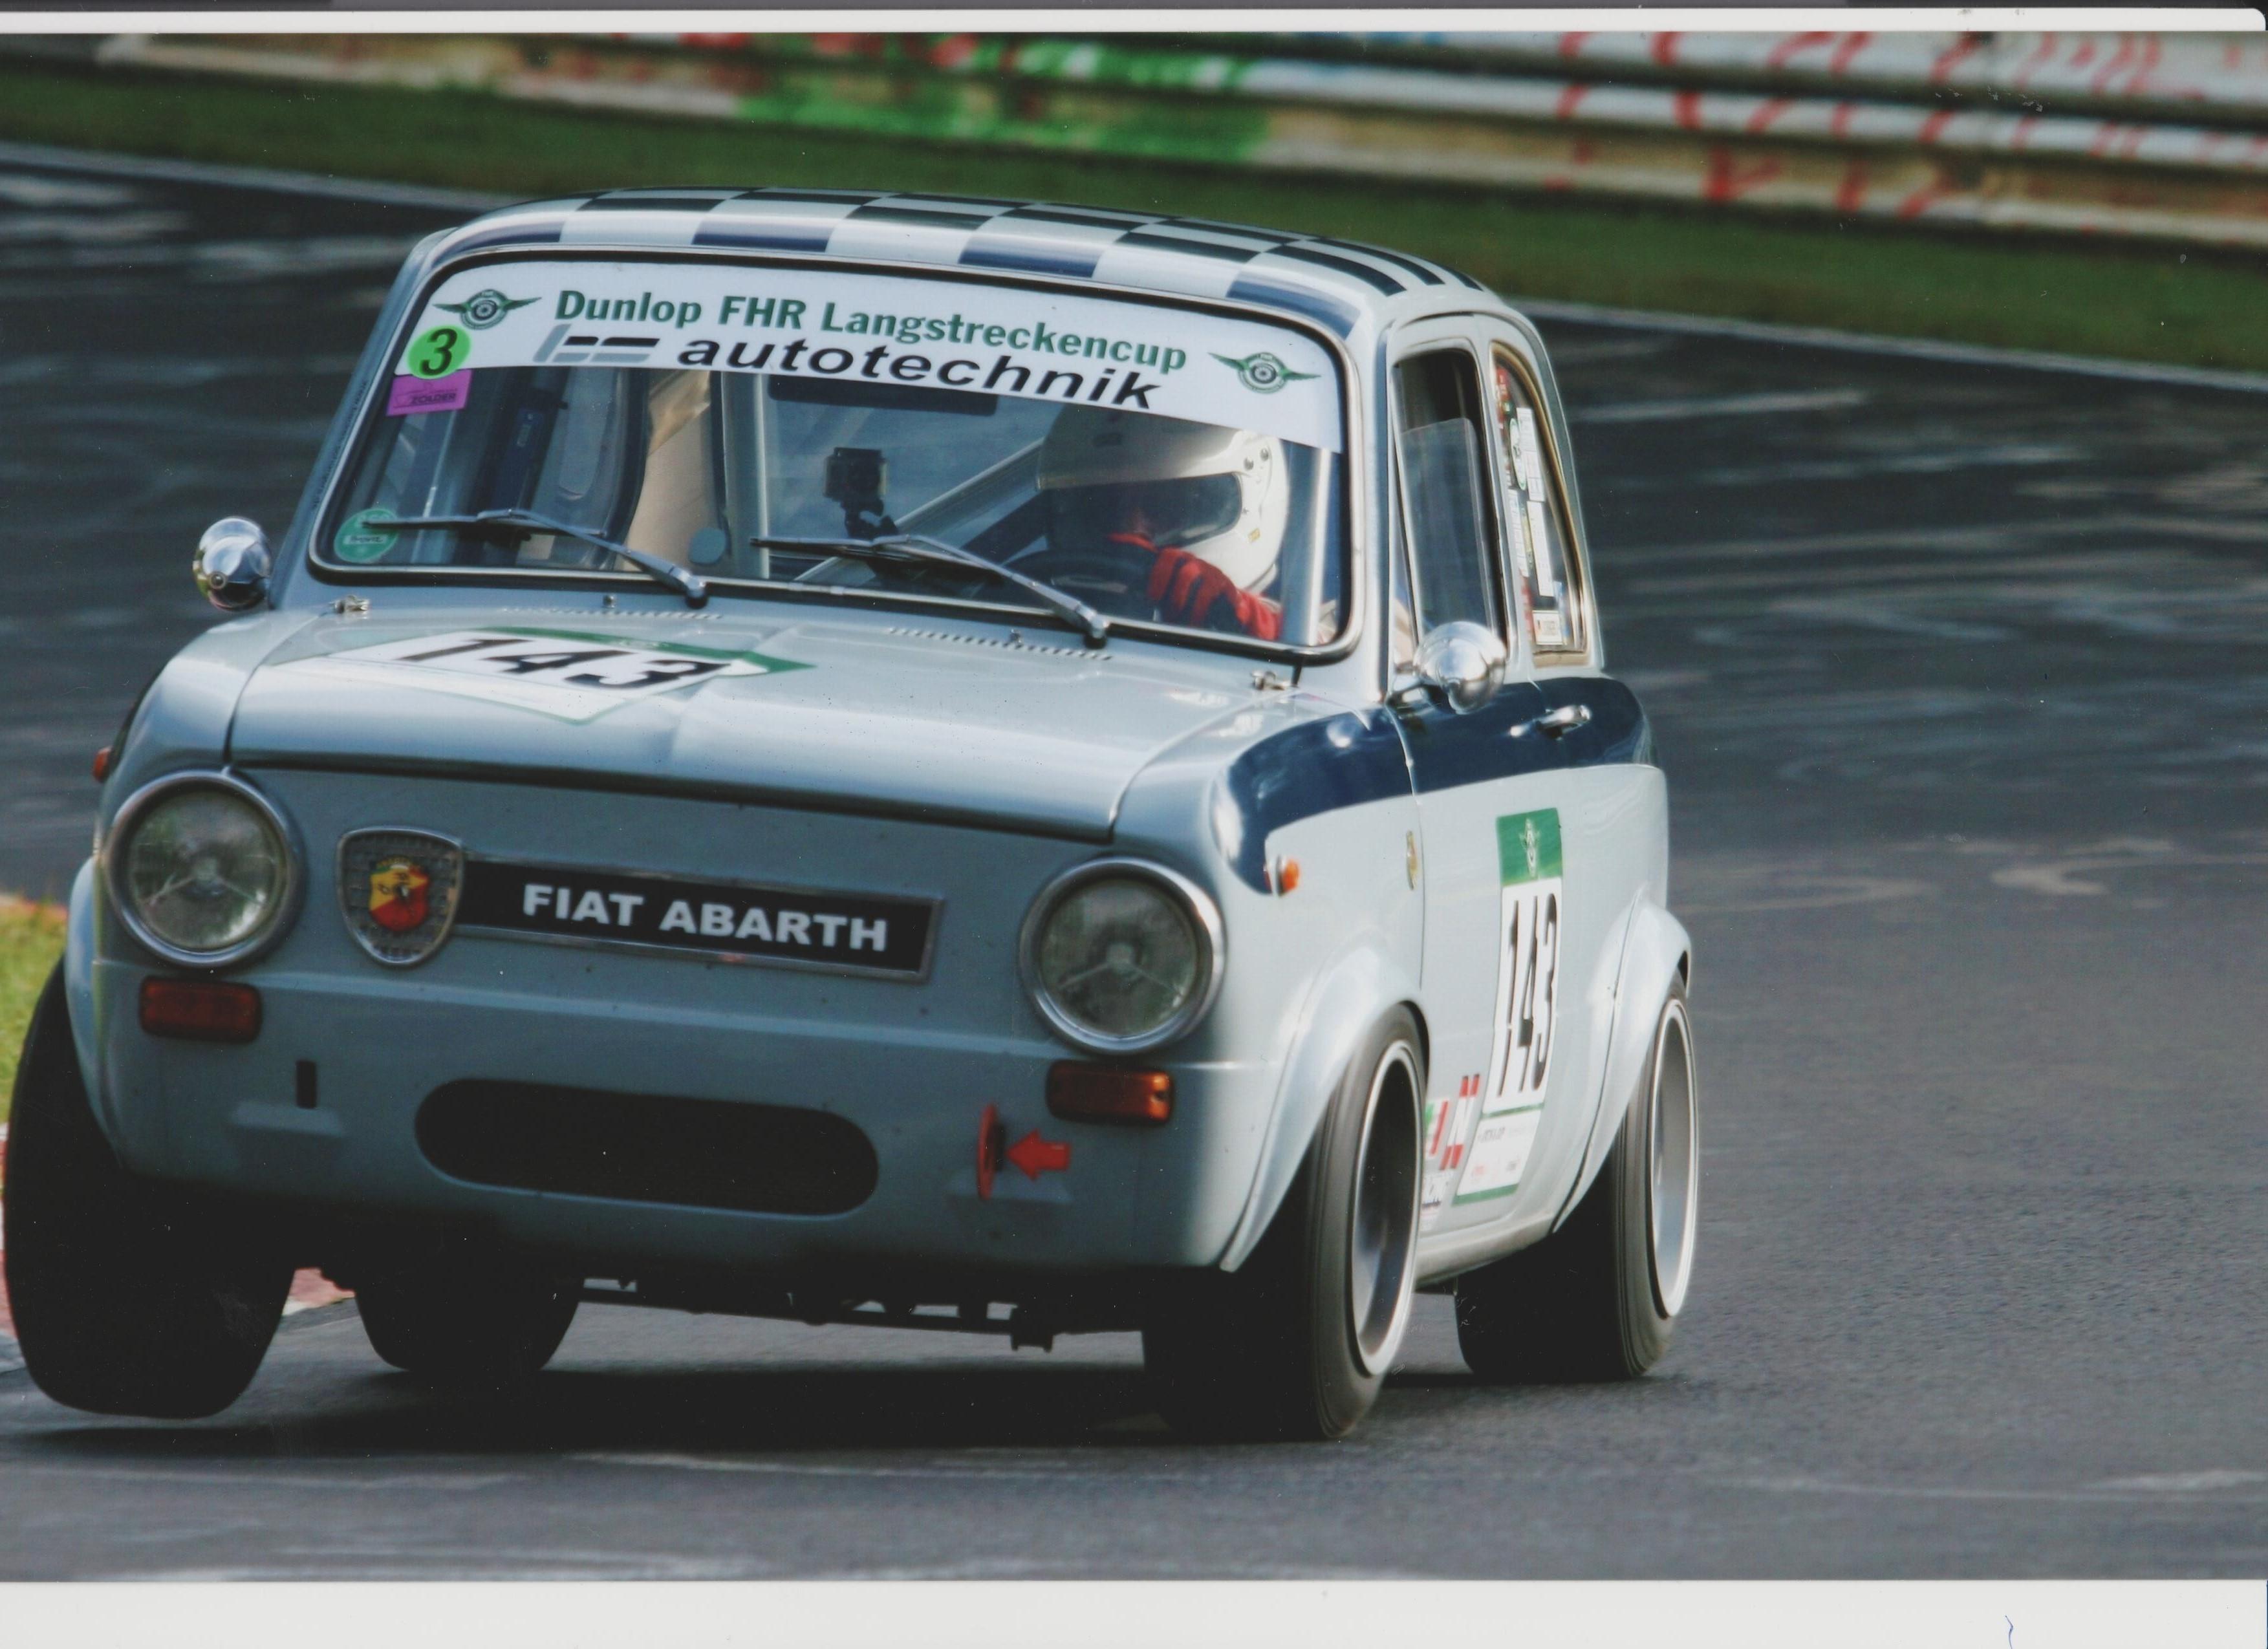 Fiat Abarth 1000 Ot New Racingcar Has Just Arrived